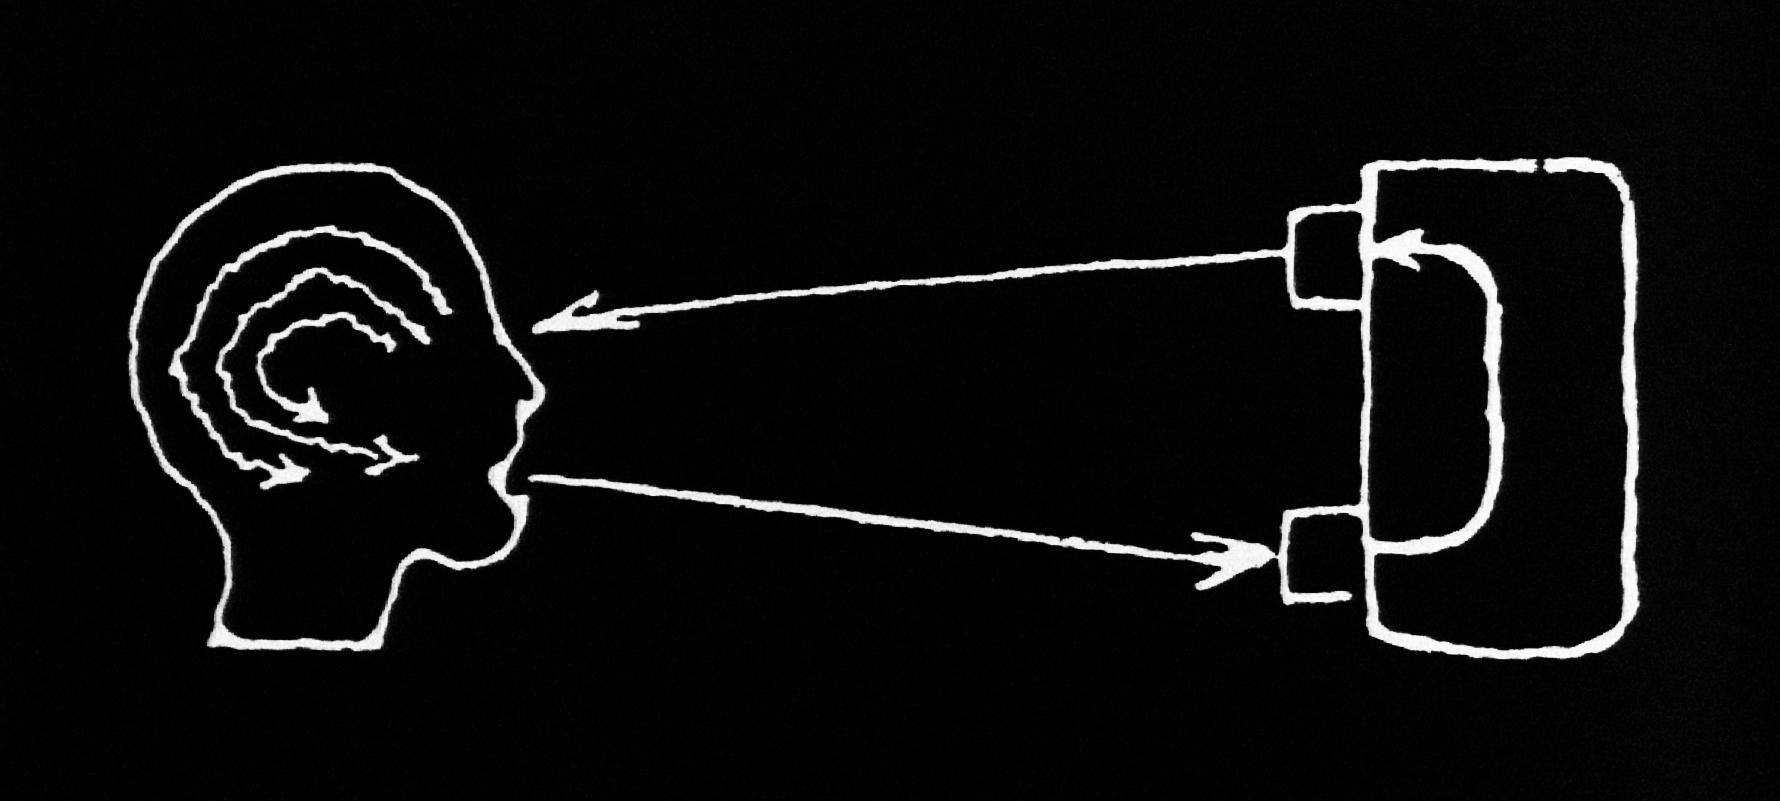 Figure 1 – Yershóv Diagram  (1963)  Director-agent model of human-machine interaction.